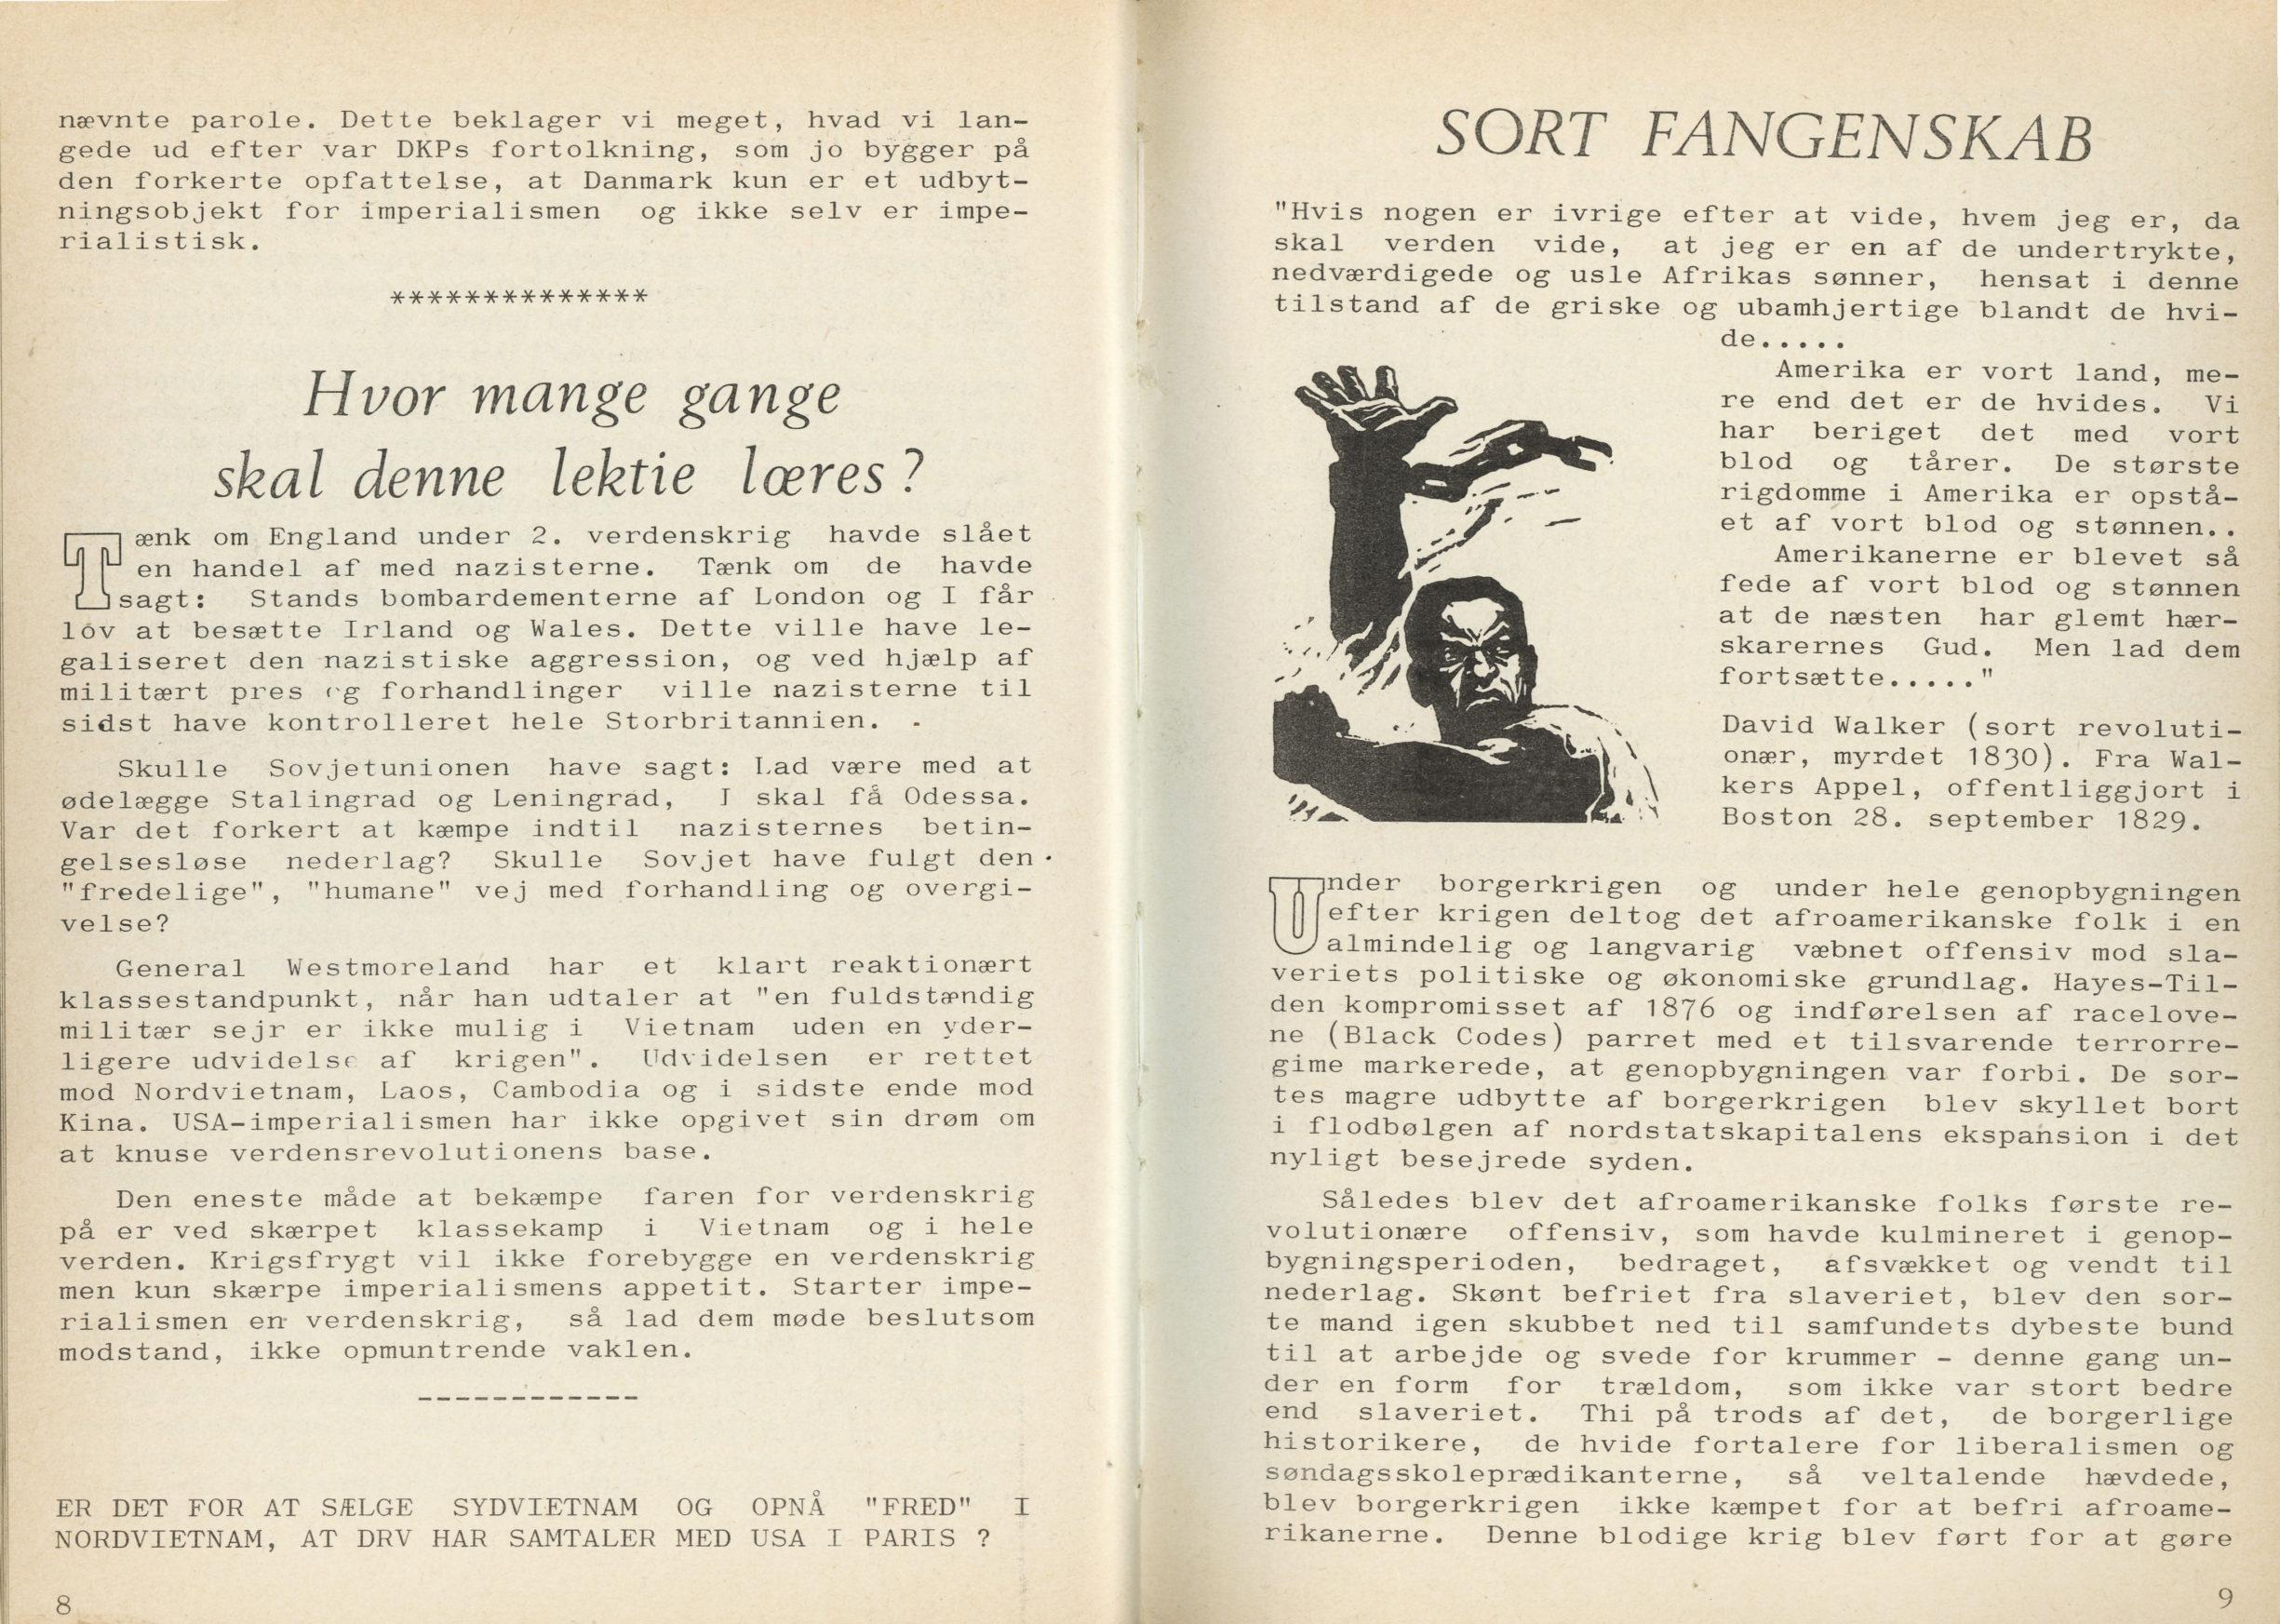 Ungkommunisten1968 nr. 8 s. 8-9.